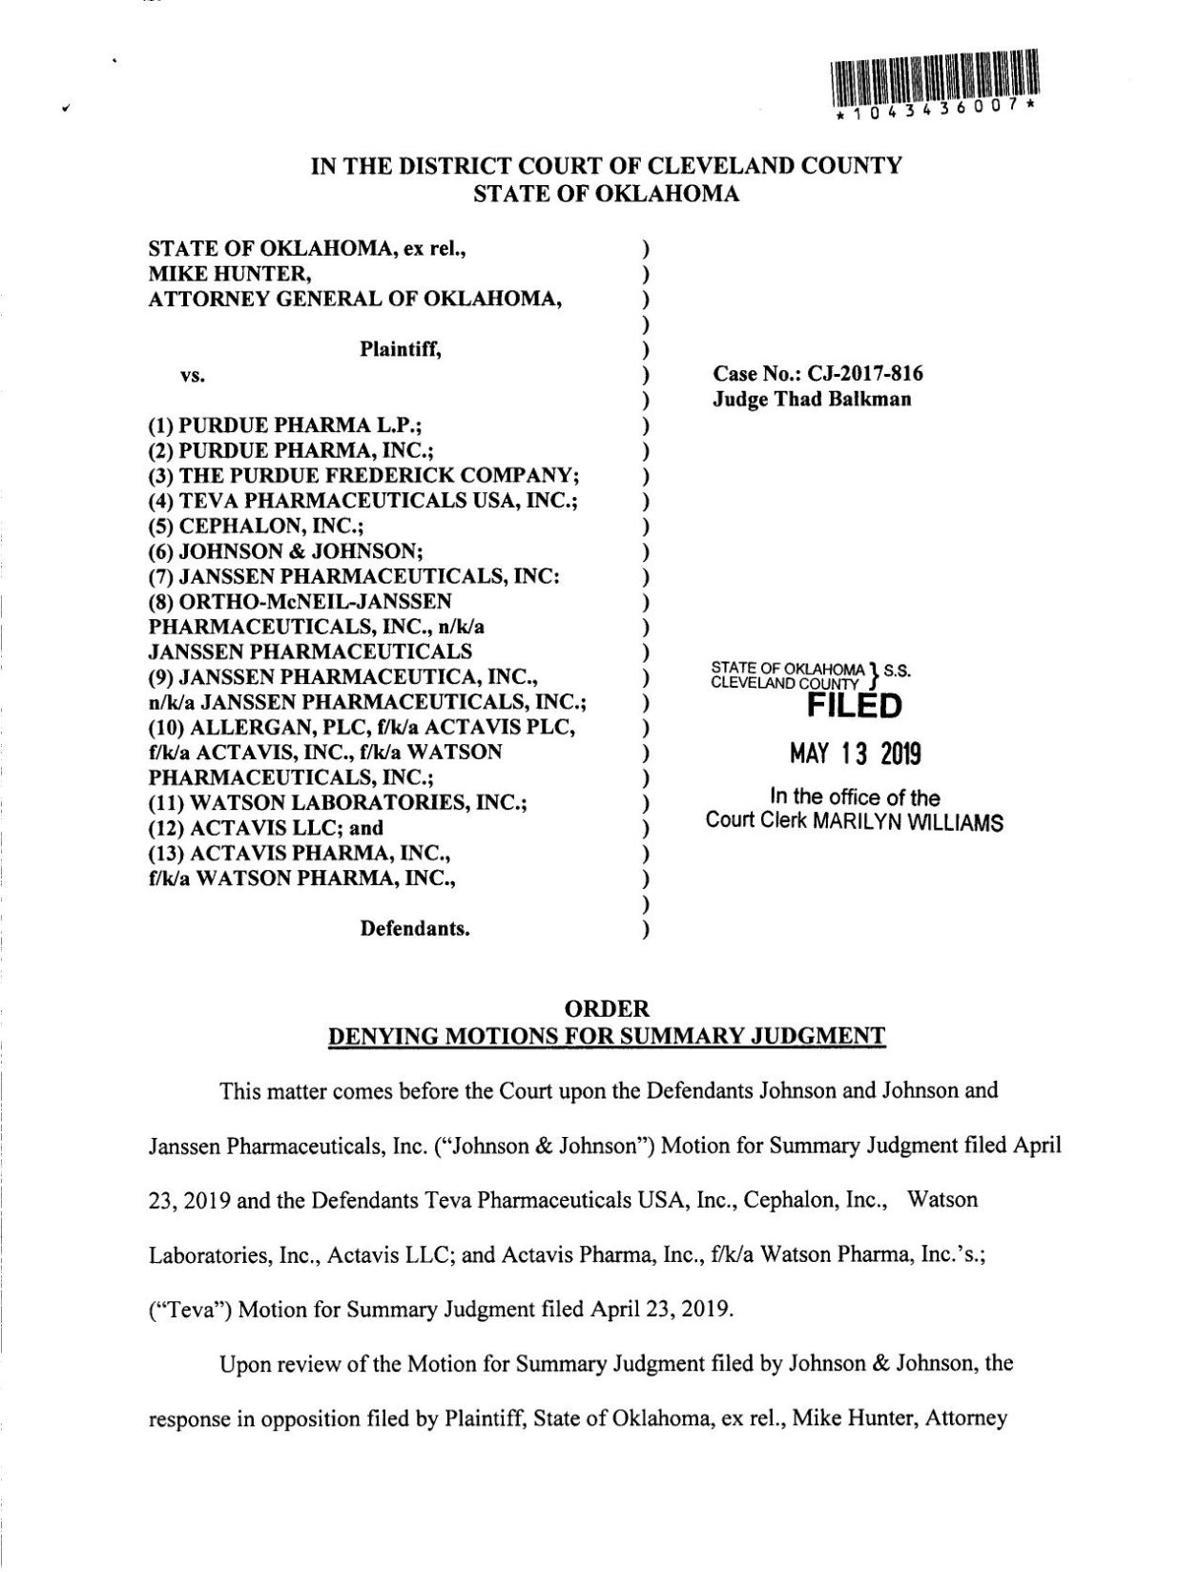 Summary judgment order